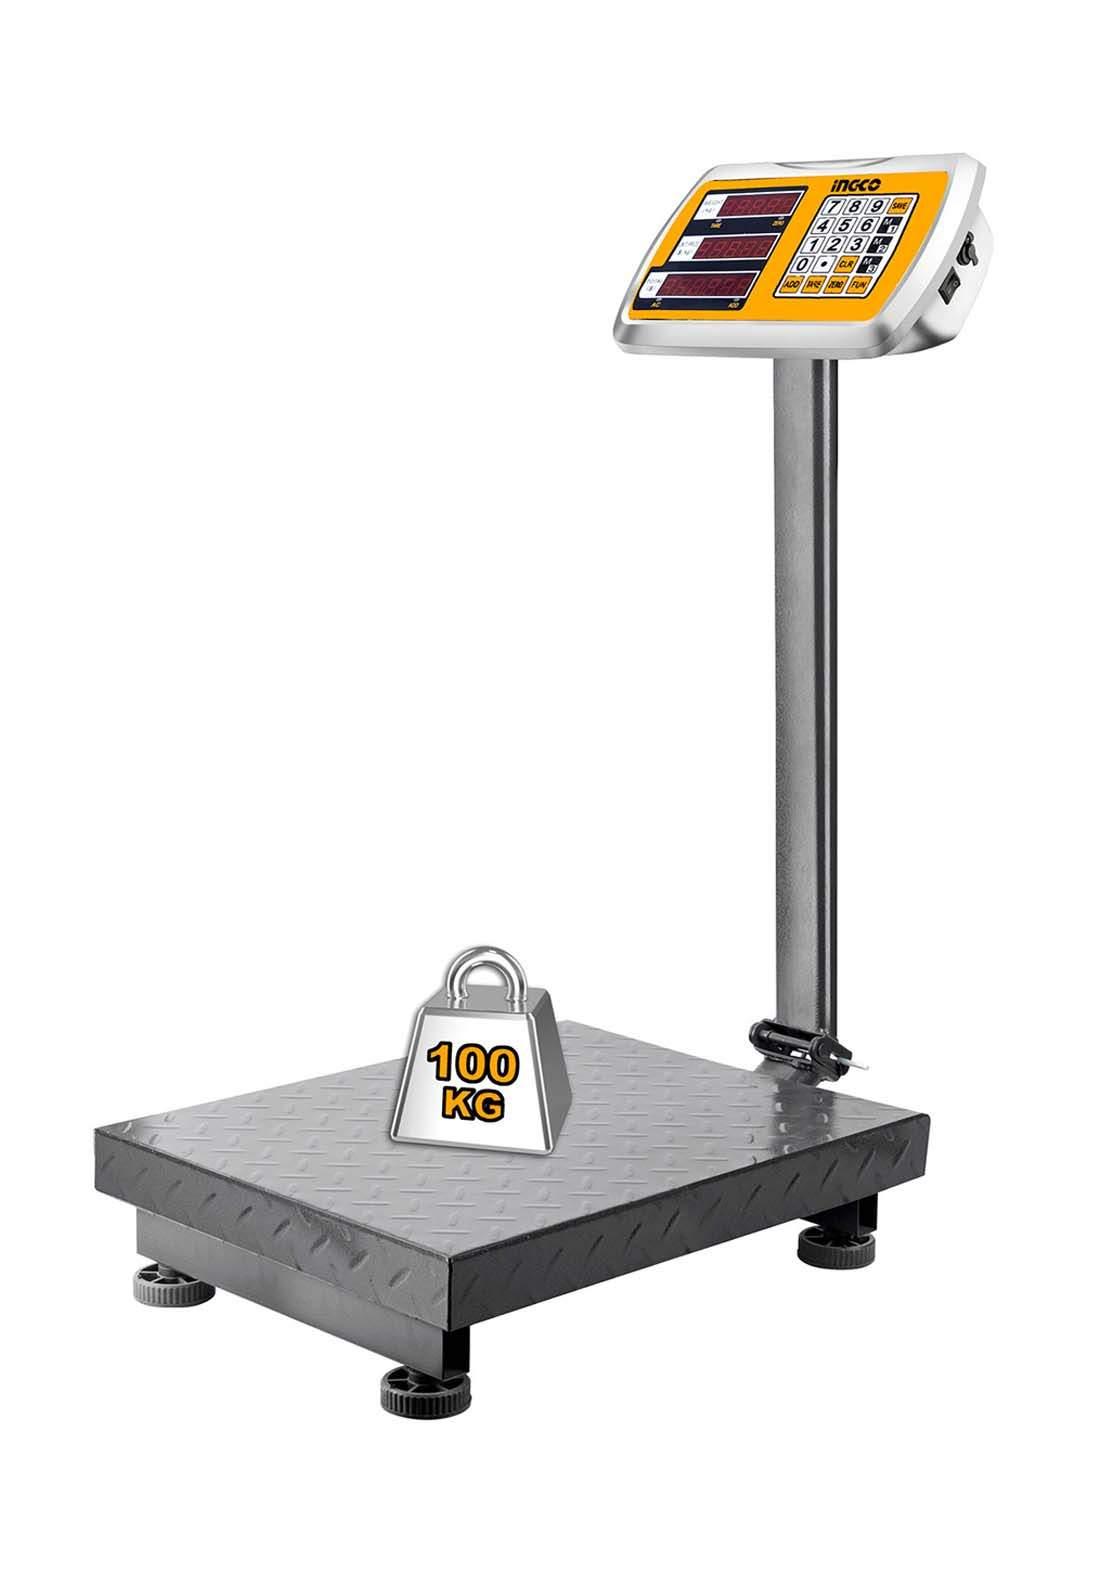 Ingco HESA31003 Electronic Scale 100 kg ميزان عمودي الكتروني